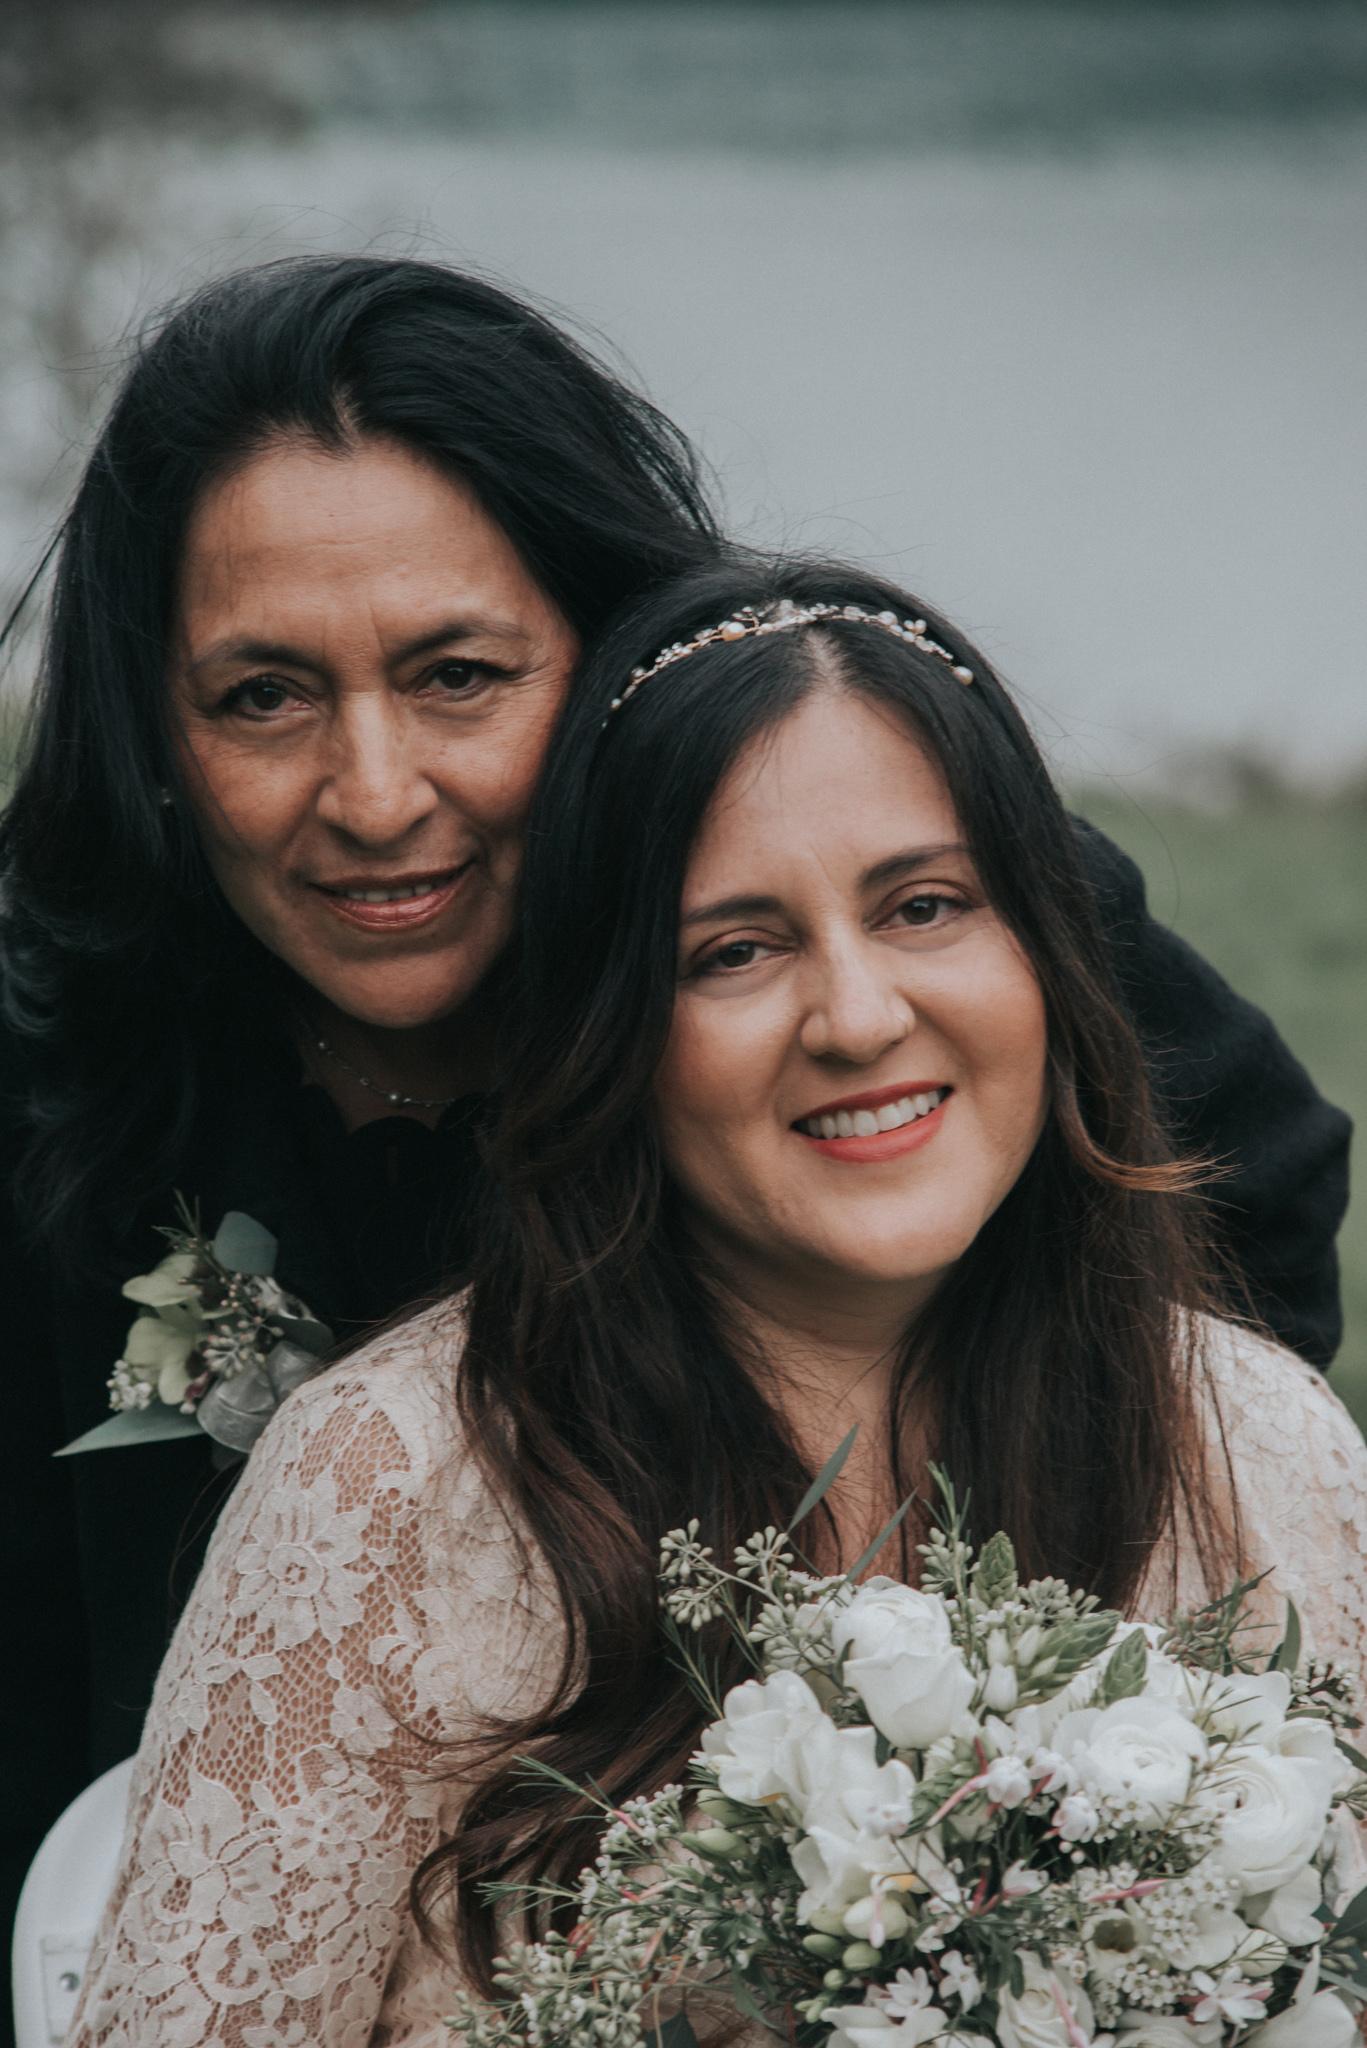 Bellingham wedding Woodstock Farms Vishal Goklani Seattle Wedding Photographer030.JPG